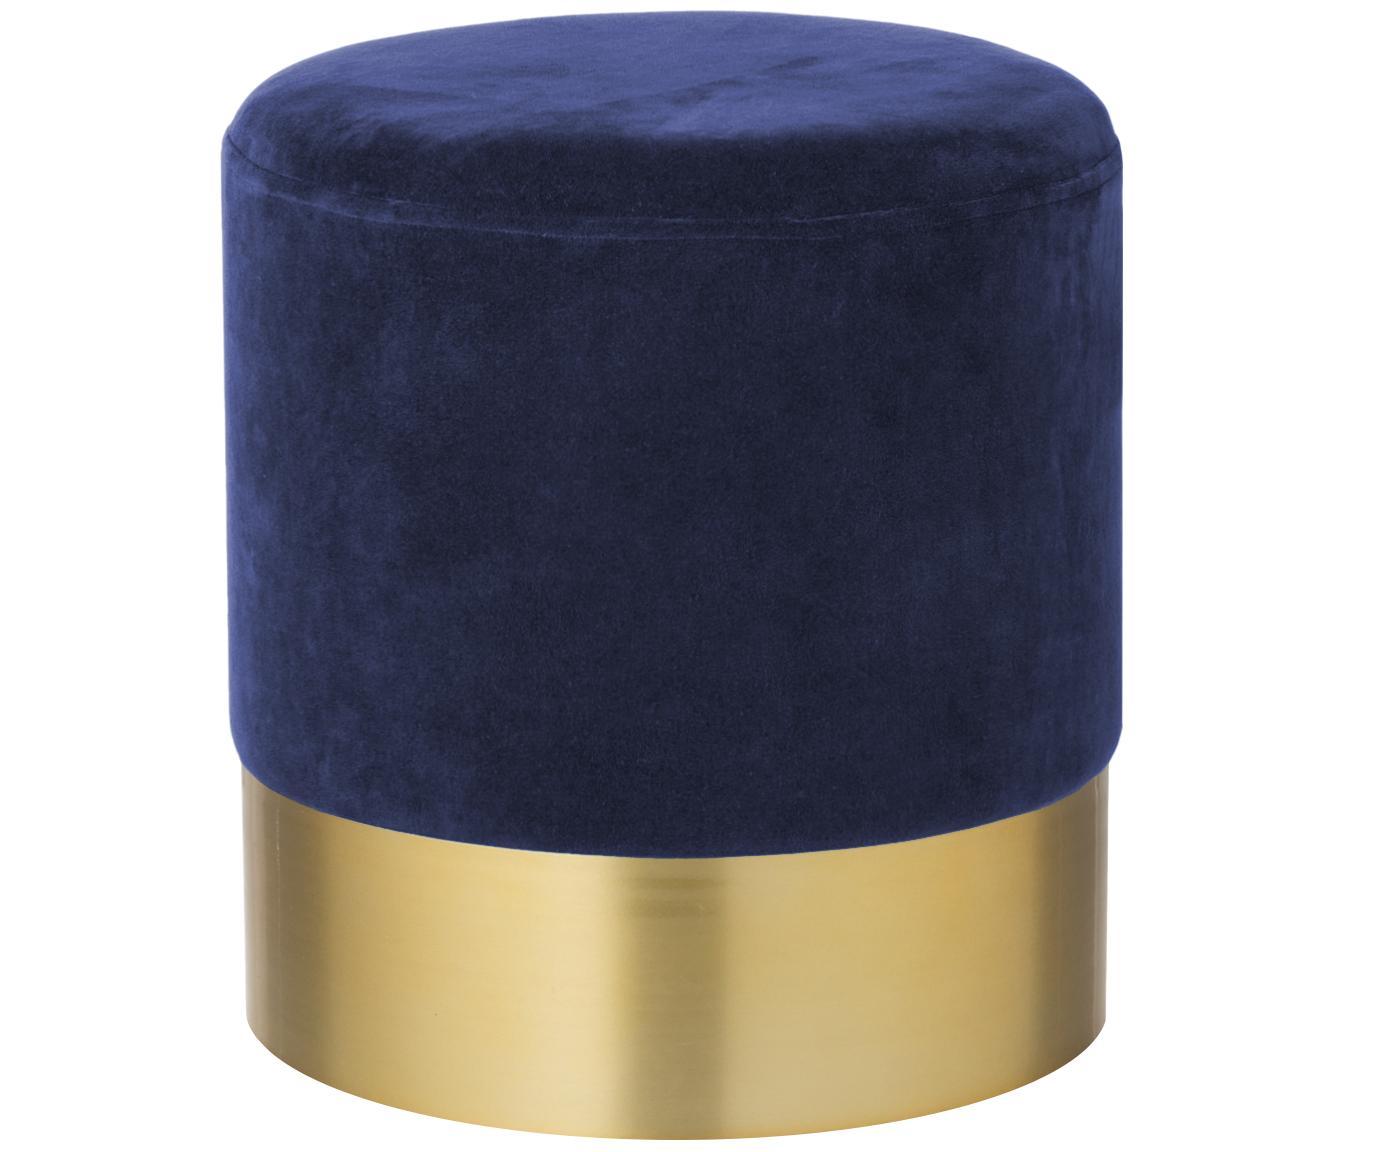 Samt-Hocker Harlow, Bezug: Baumwollsamt, Marineblau, Goldfarben, Ø 38 x H 42 cm